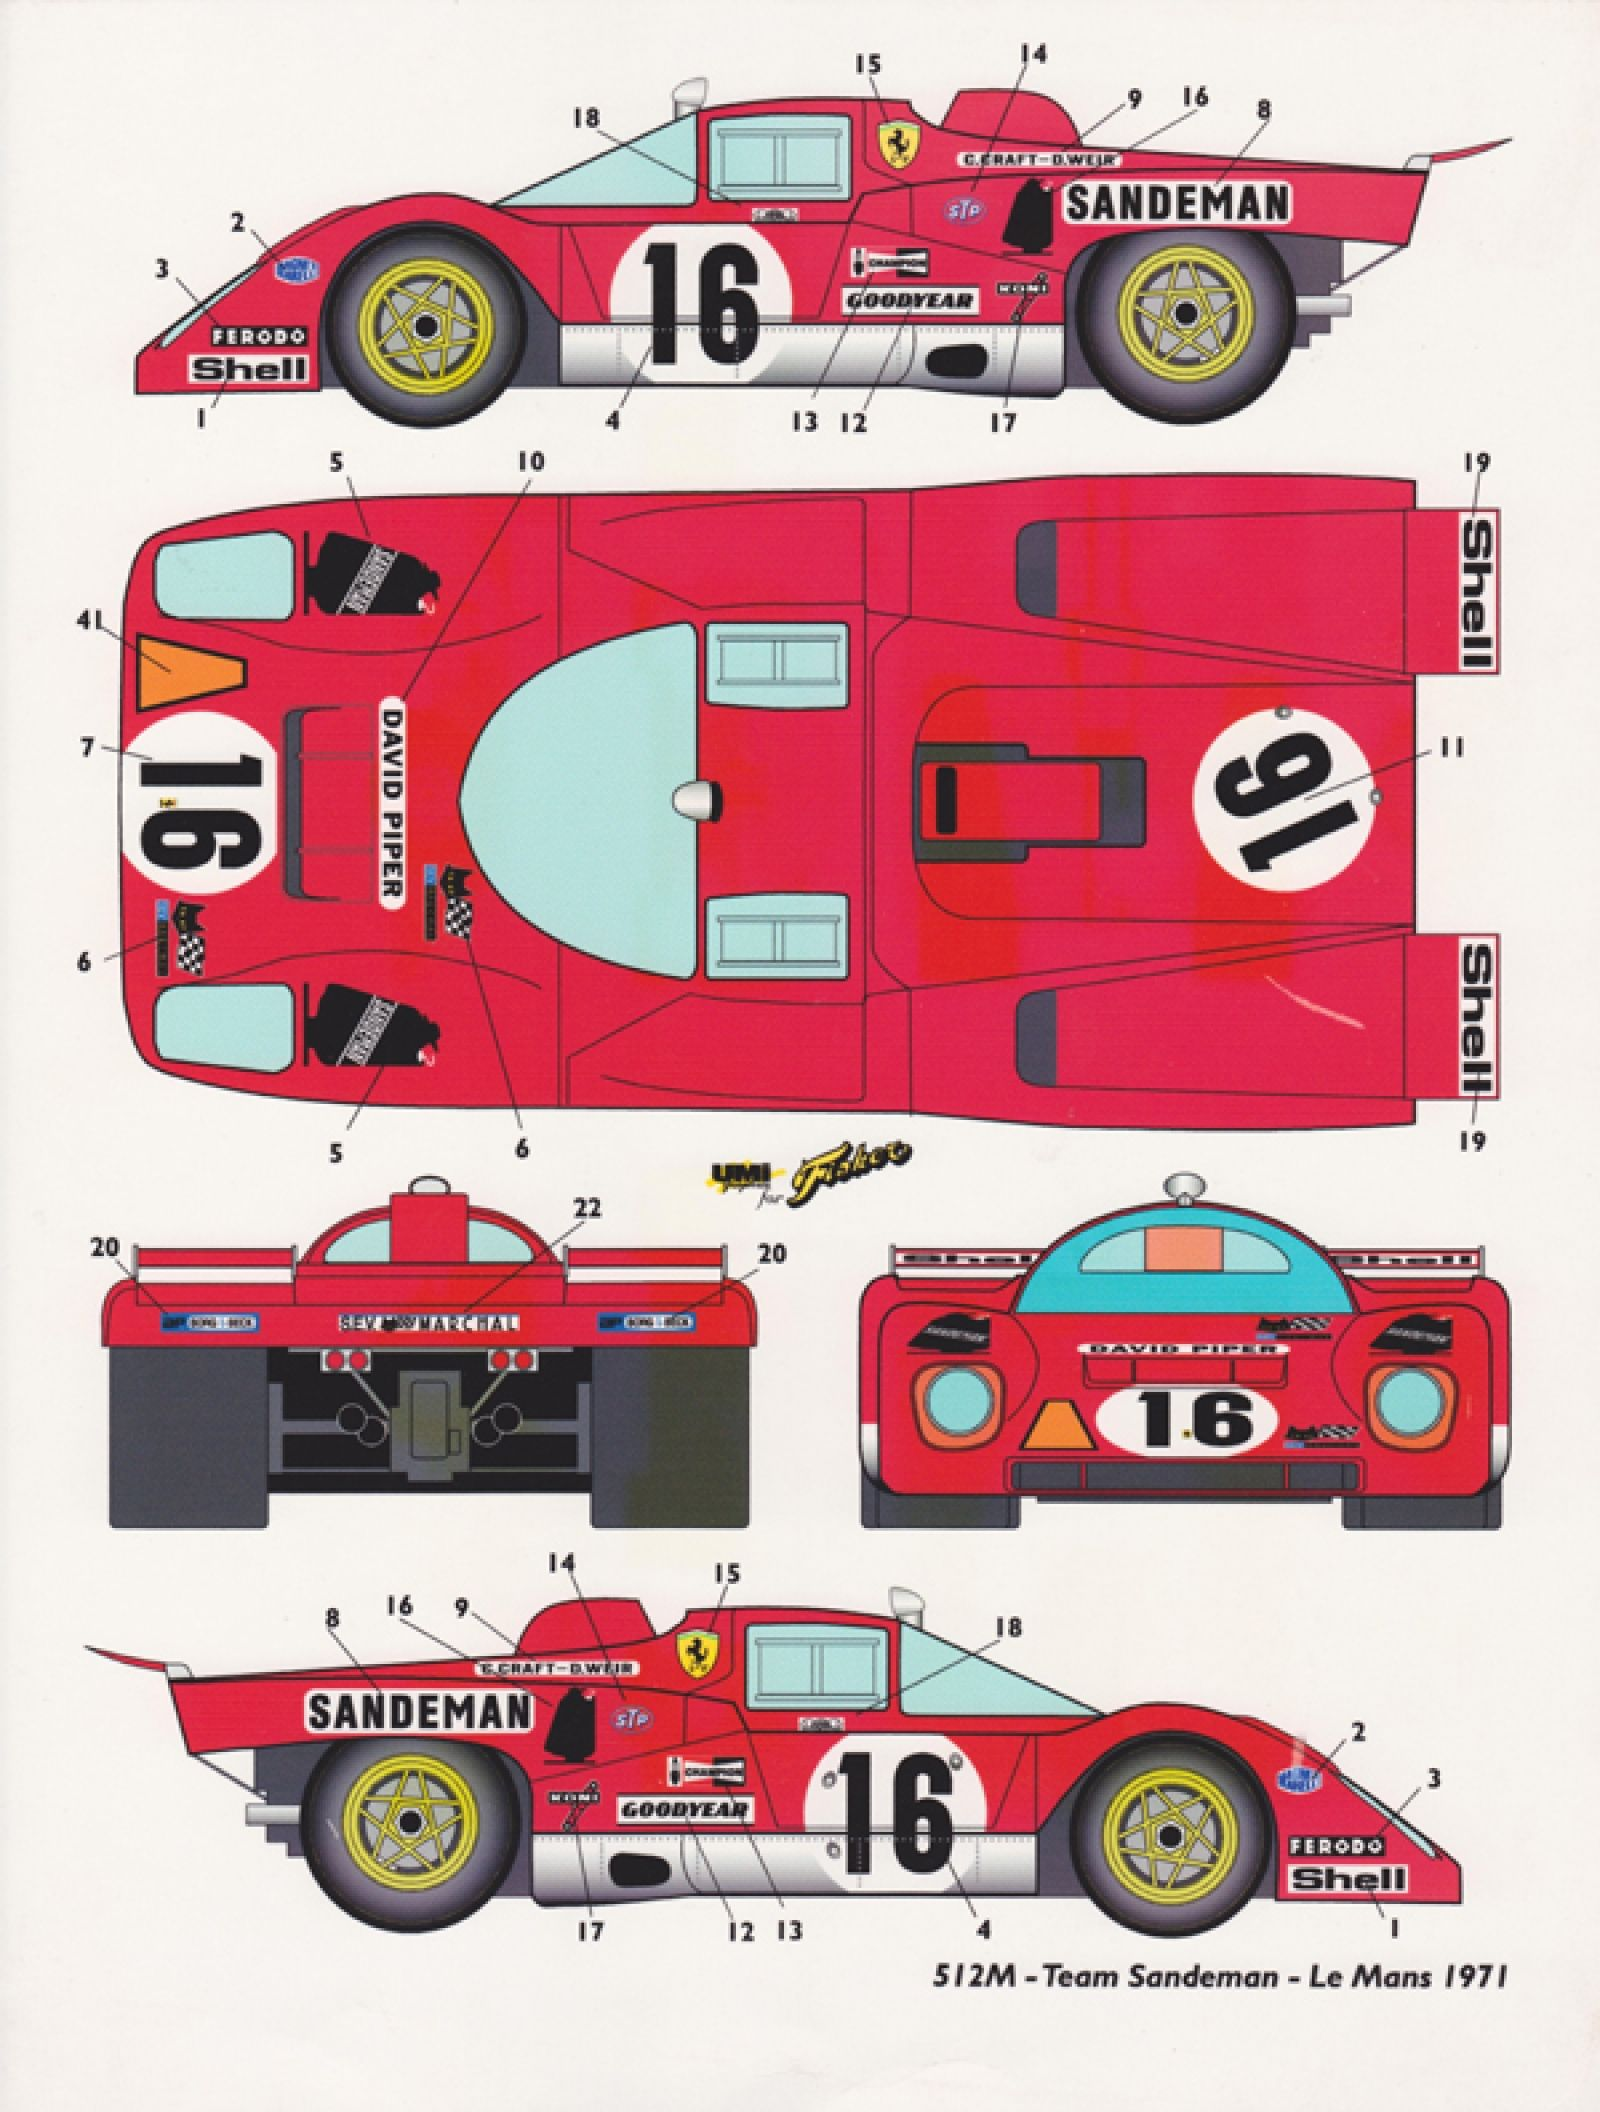 Ferrari 512m sandeman racing car blueprint pinterest ferrari ferrari 512m sandeman malvernweather Choice Image